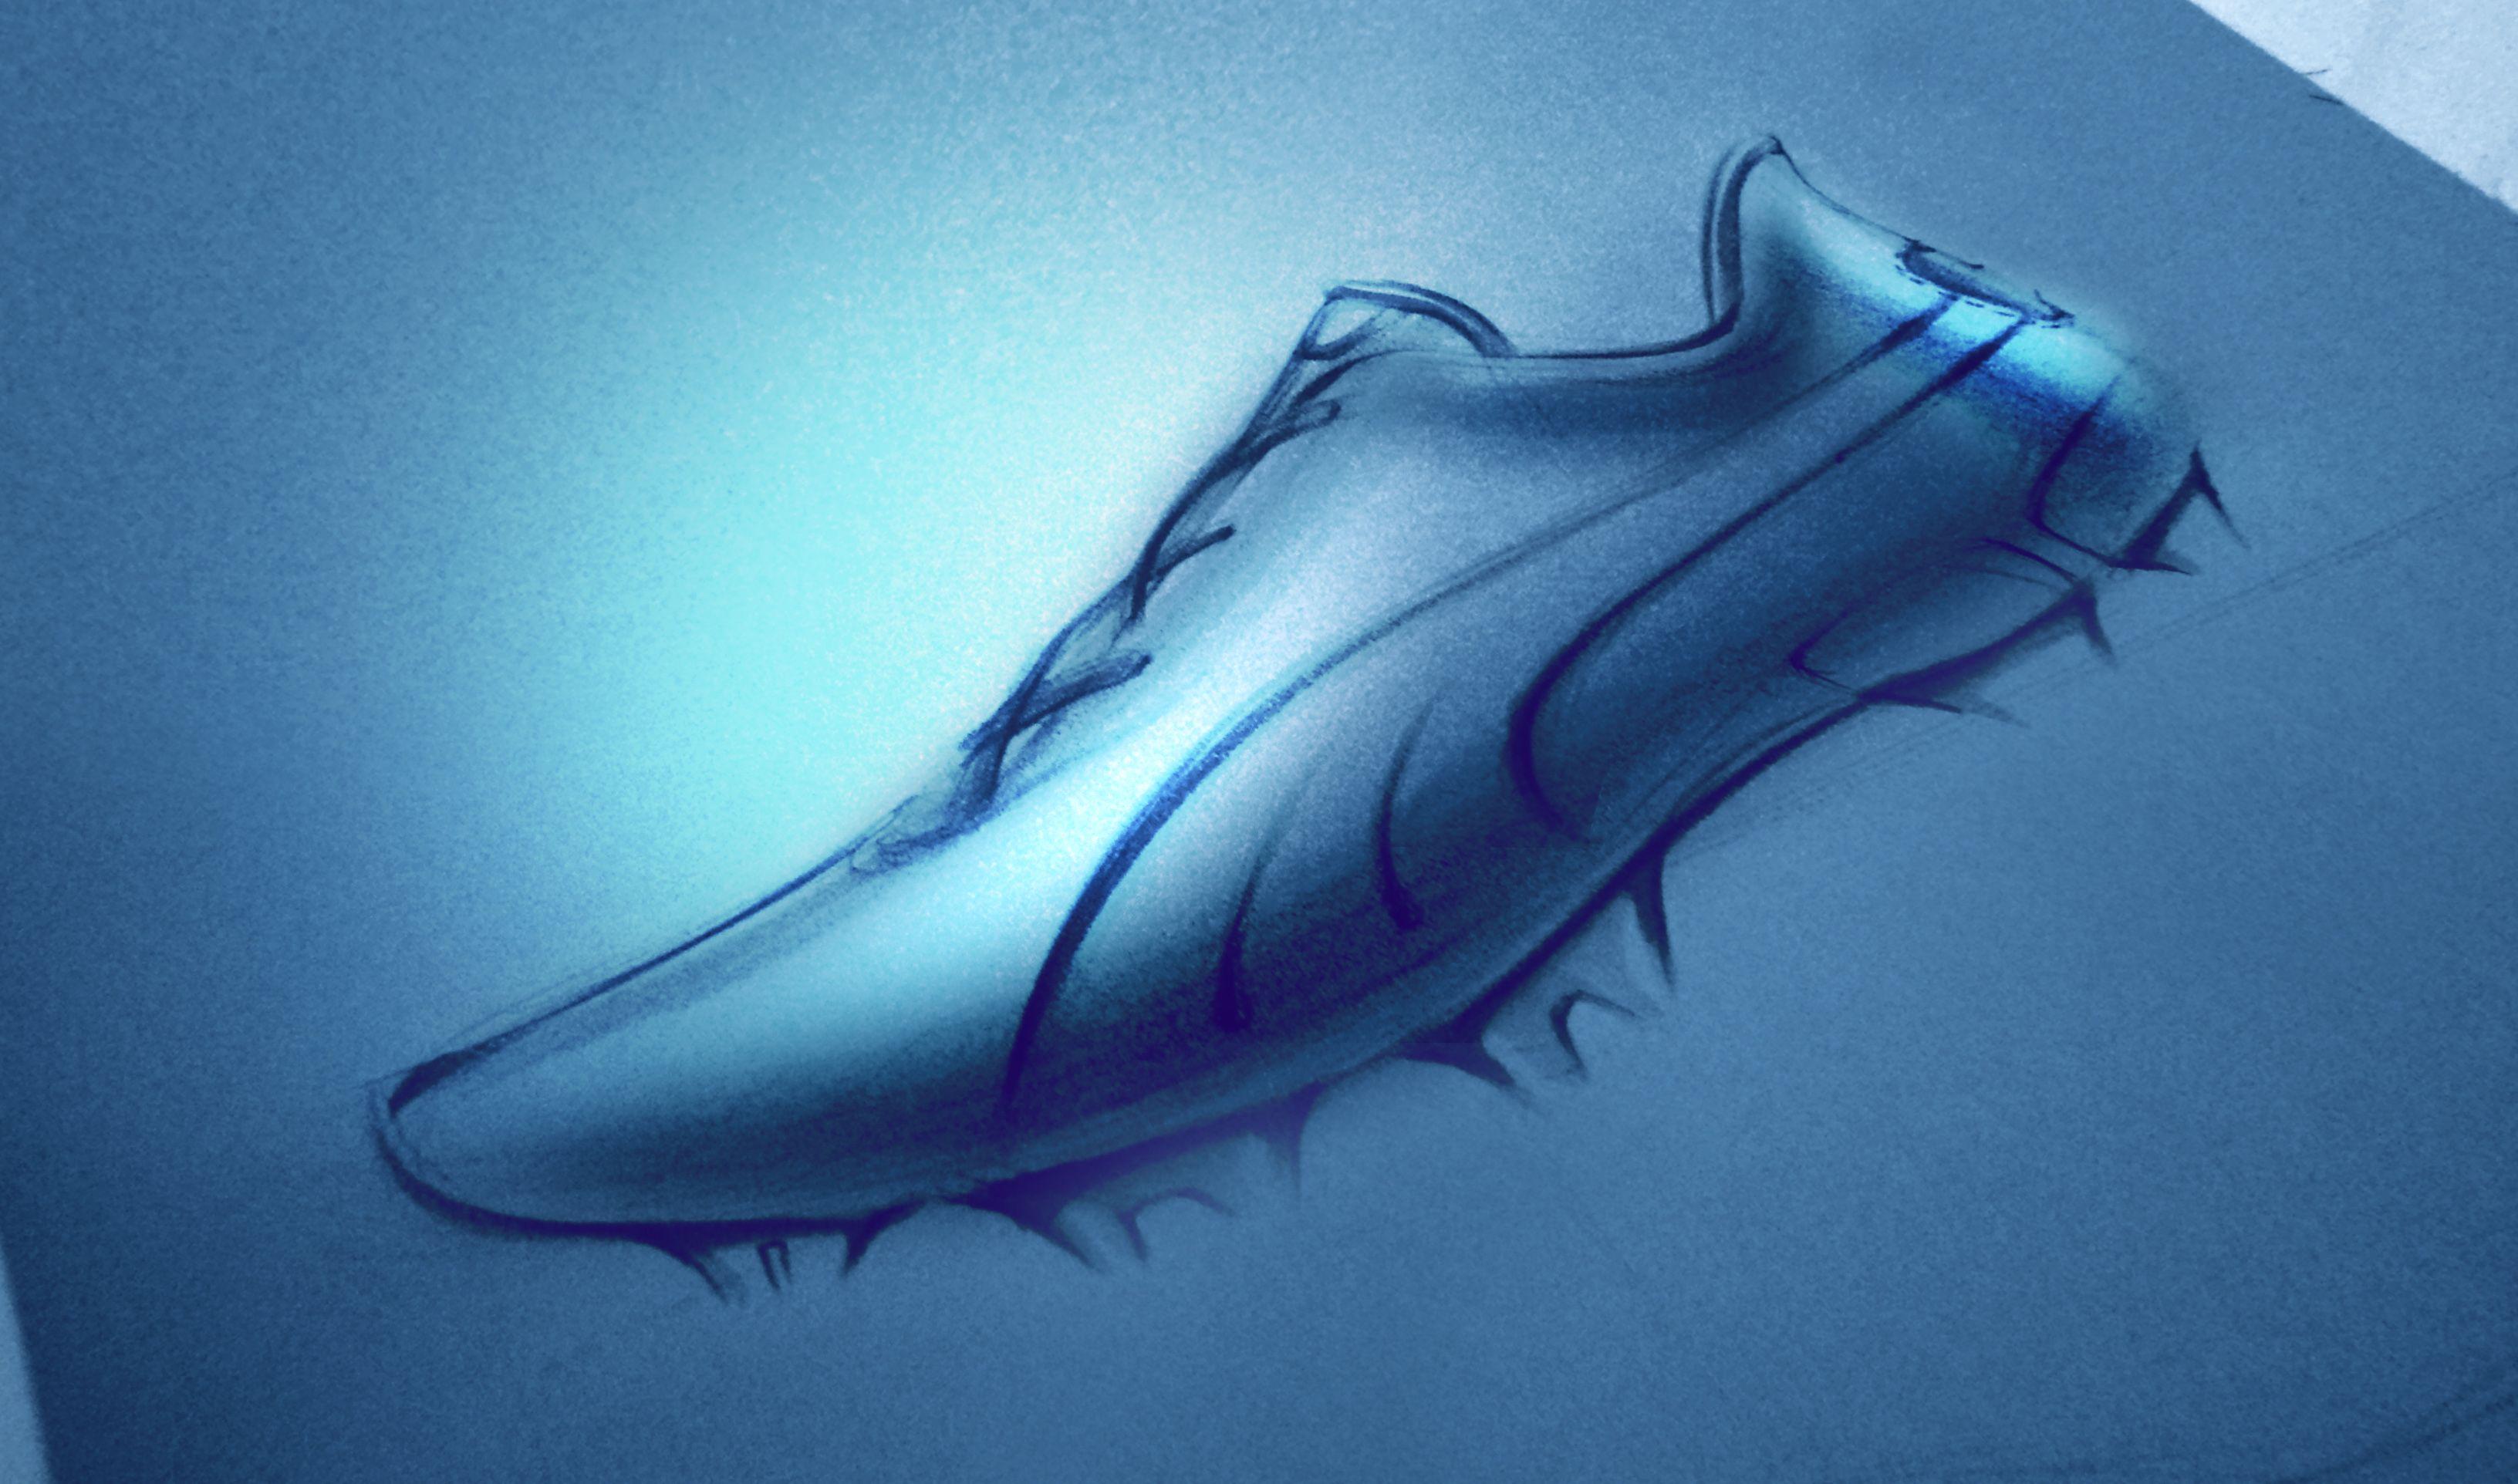 Another canson sketch #Roshan Hakkim #Sketch Bug #sketch #shoe